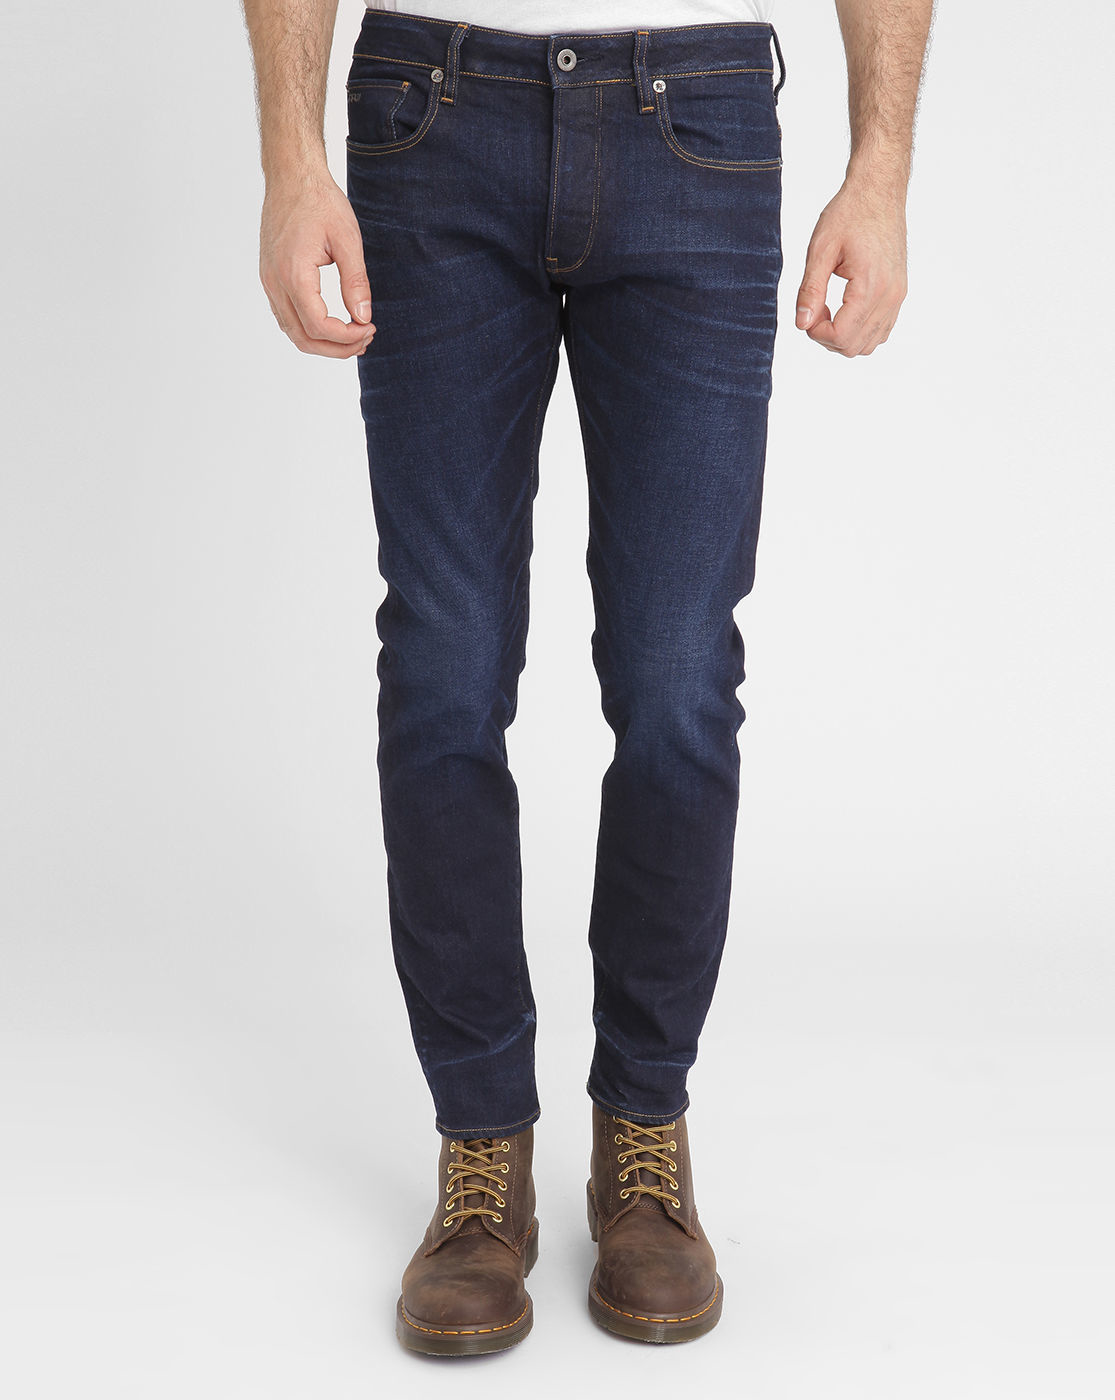 g star raw faded blue 3301 slim fit jeans in blue for men lyst. Black Bedroom Furniture Sets. Home Design Ideas